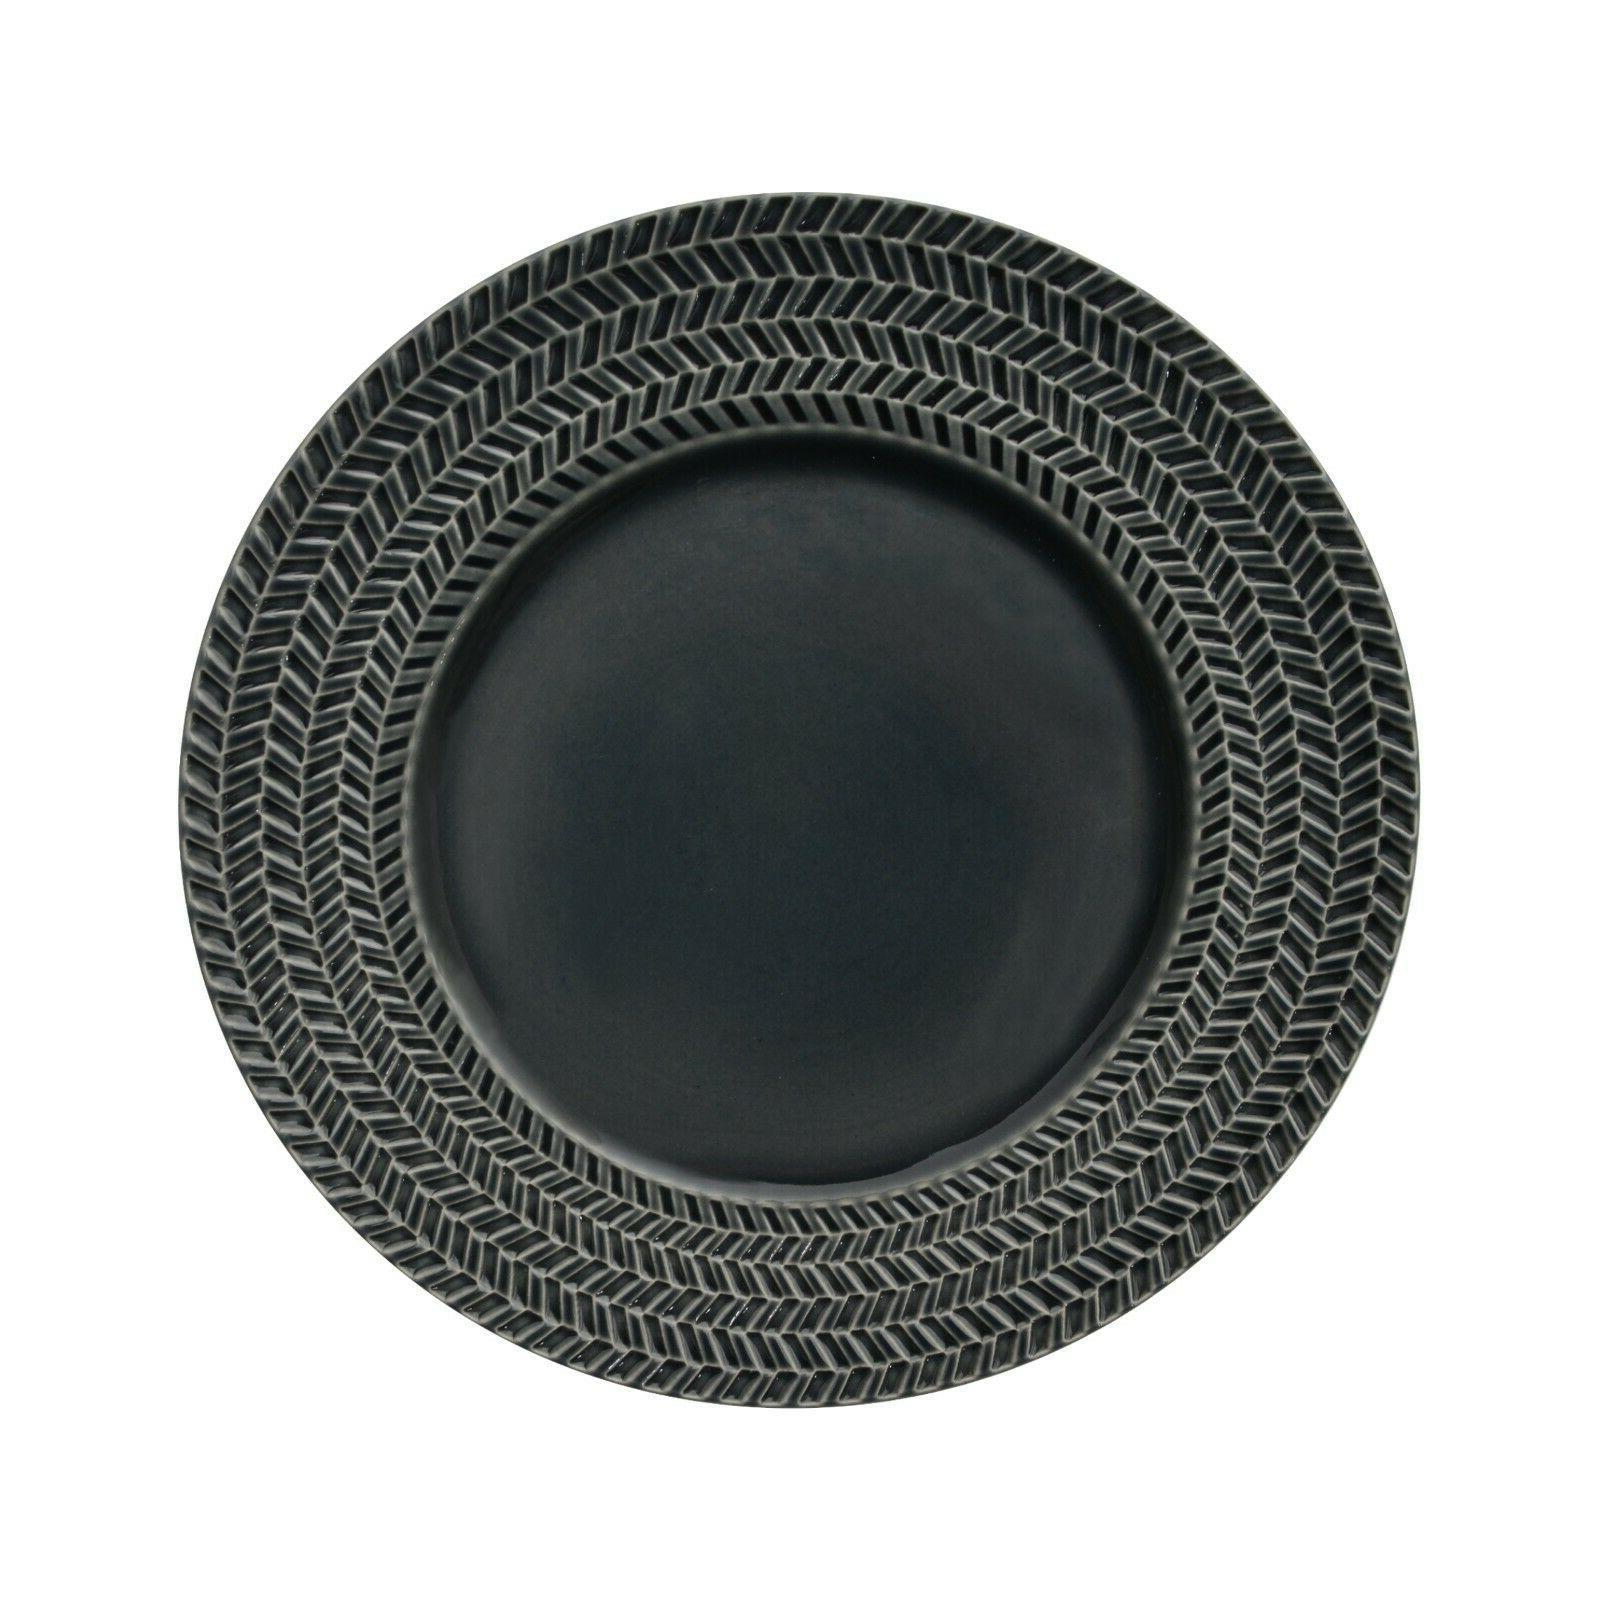 Sango Tweed Grey 16 Reactive Stoneware Dinnerware